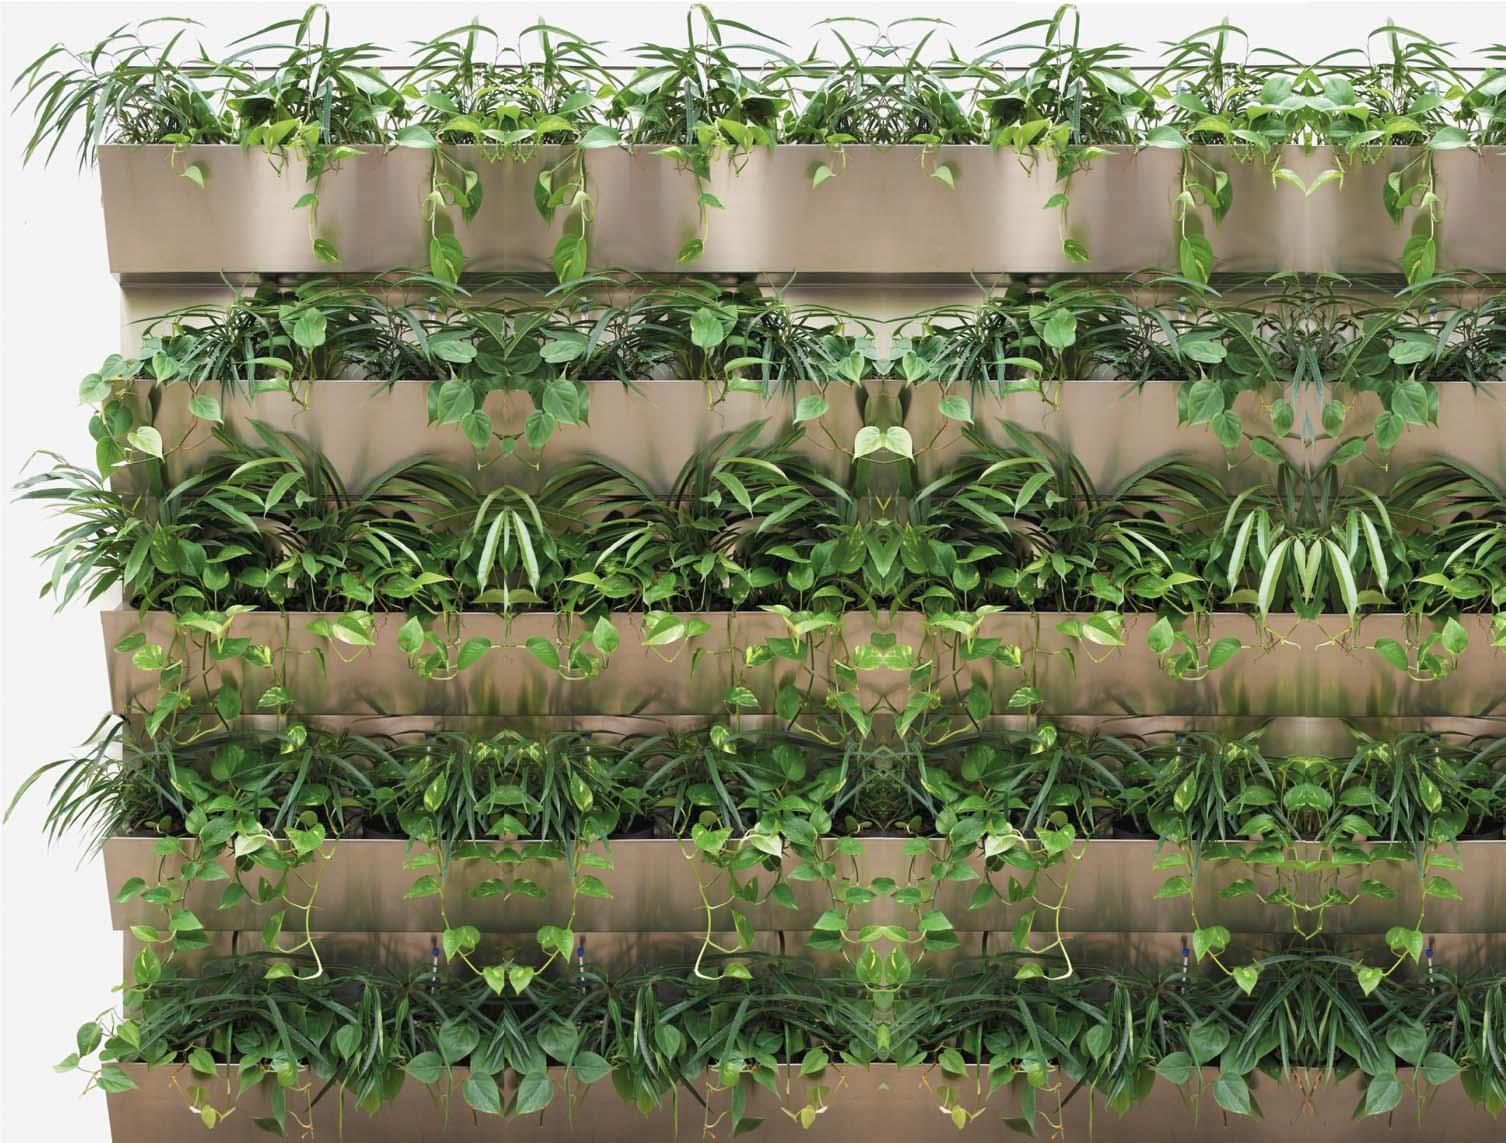 Grune Wande Fur Hydrokulturpflanzen Hydro Profi Line